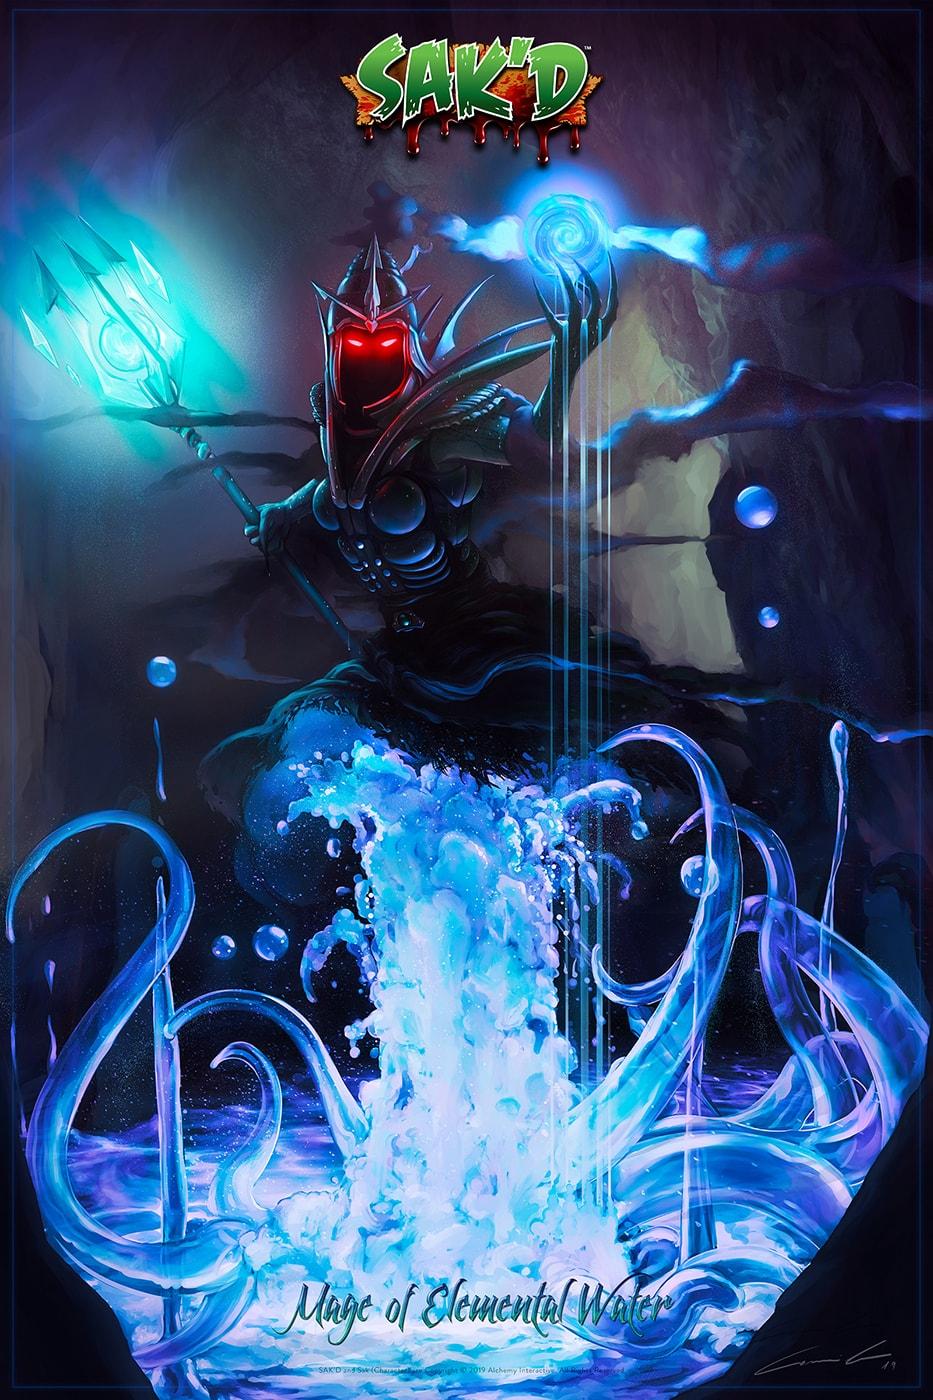 SAK'D - Dark Mage of Elemental Water